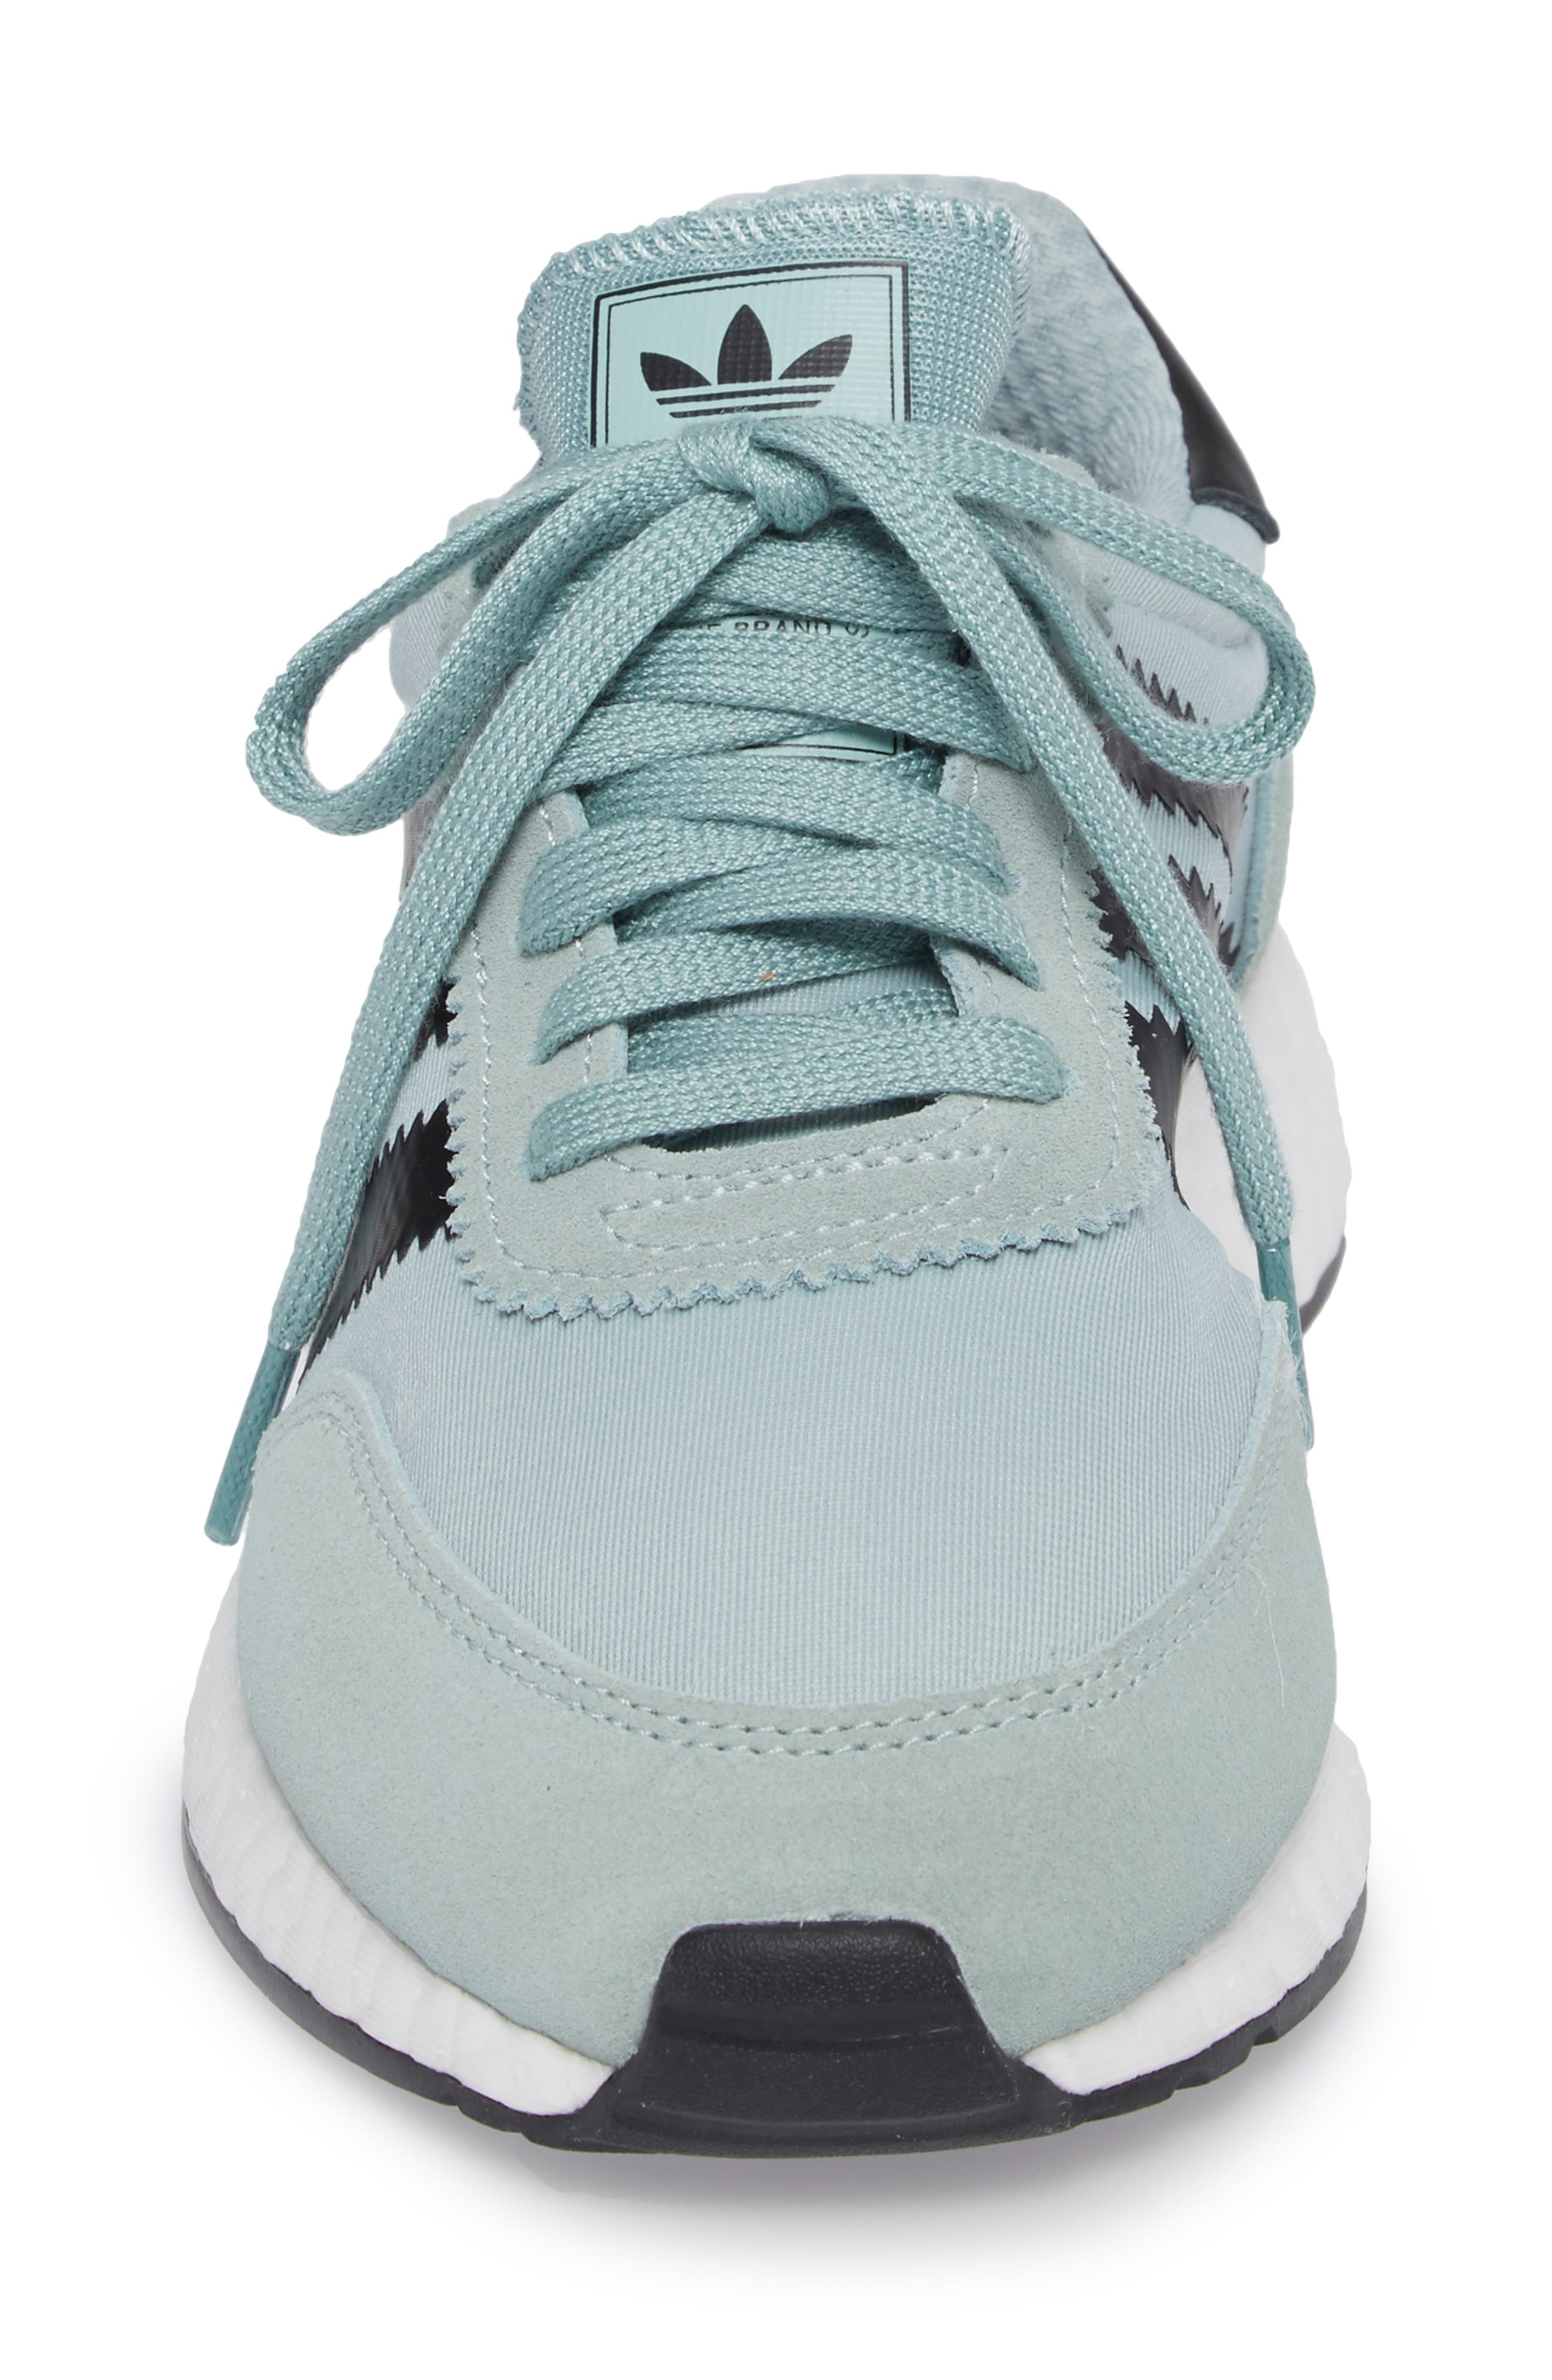 I-5923 Sneaker,                             Alternate thumbnail 5, color,                             Tactile Green/ Black/ White